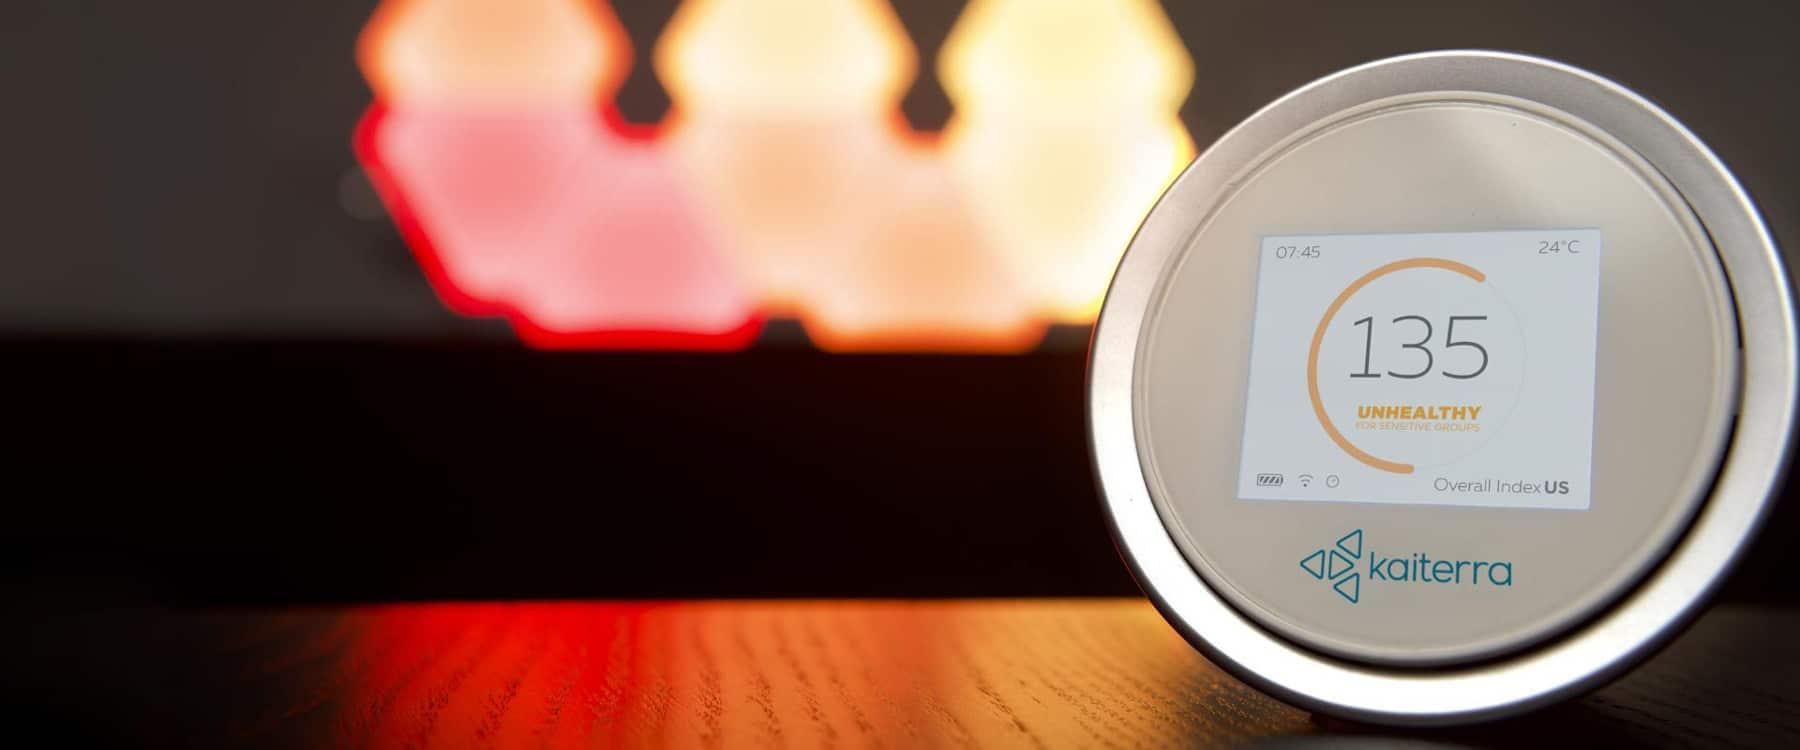 Feinstaubmessgerät LaserEgg 2 mit HomeKit Unterstützung verfügbar